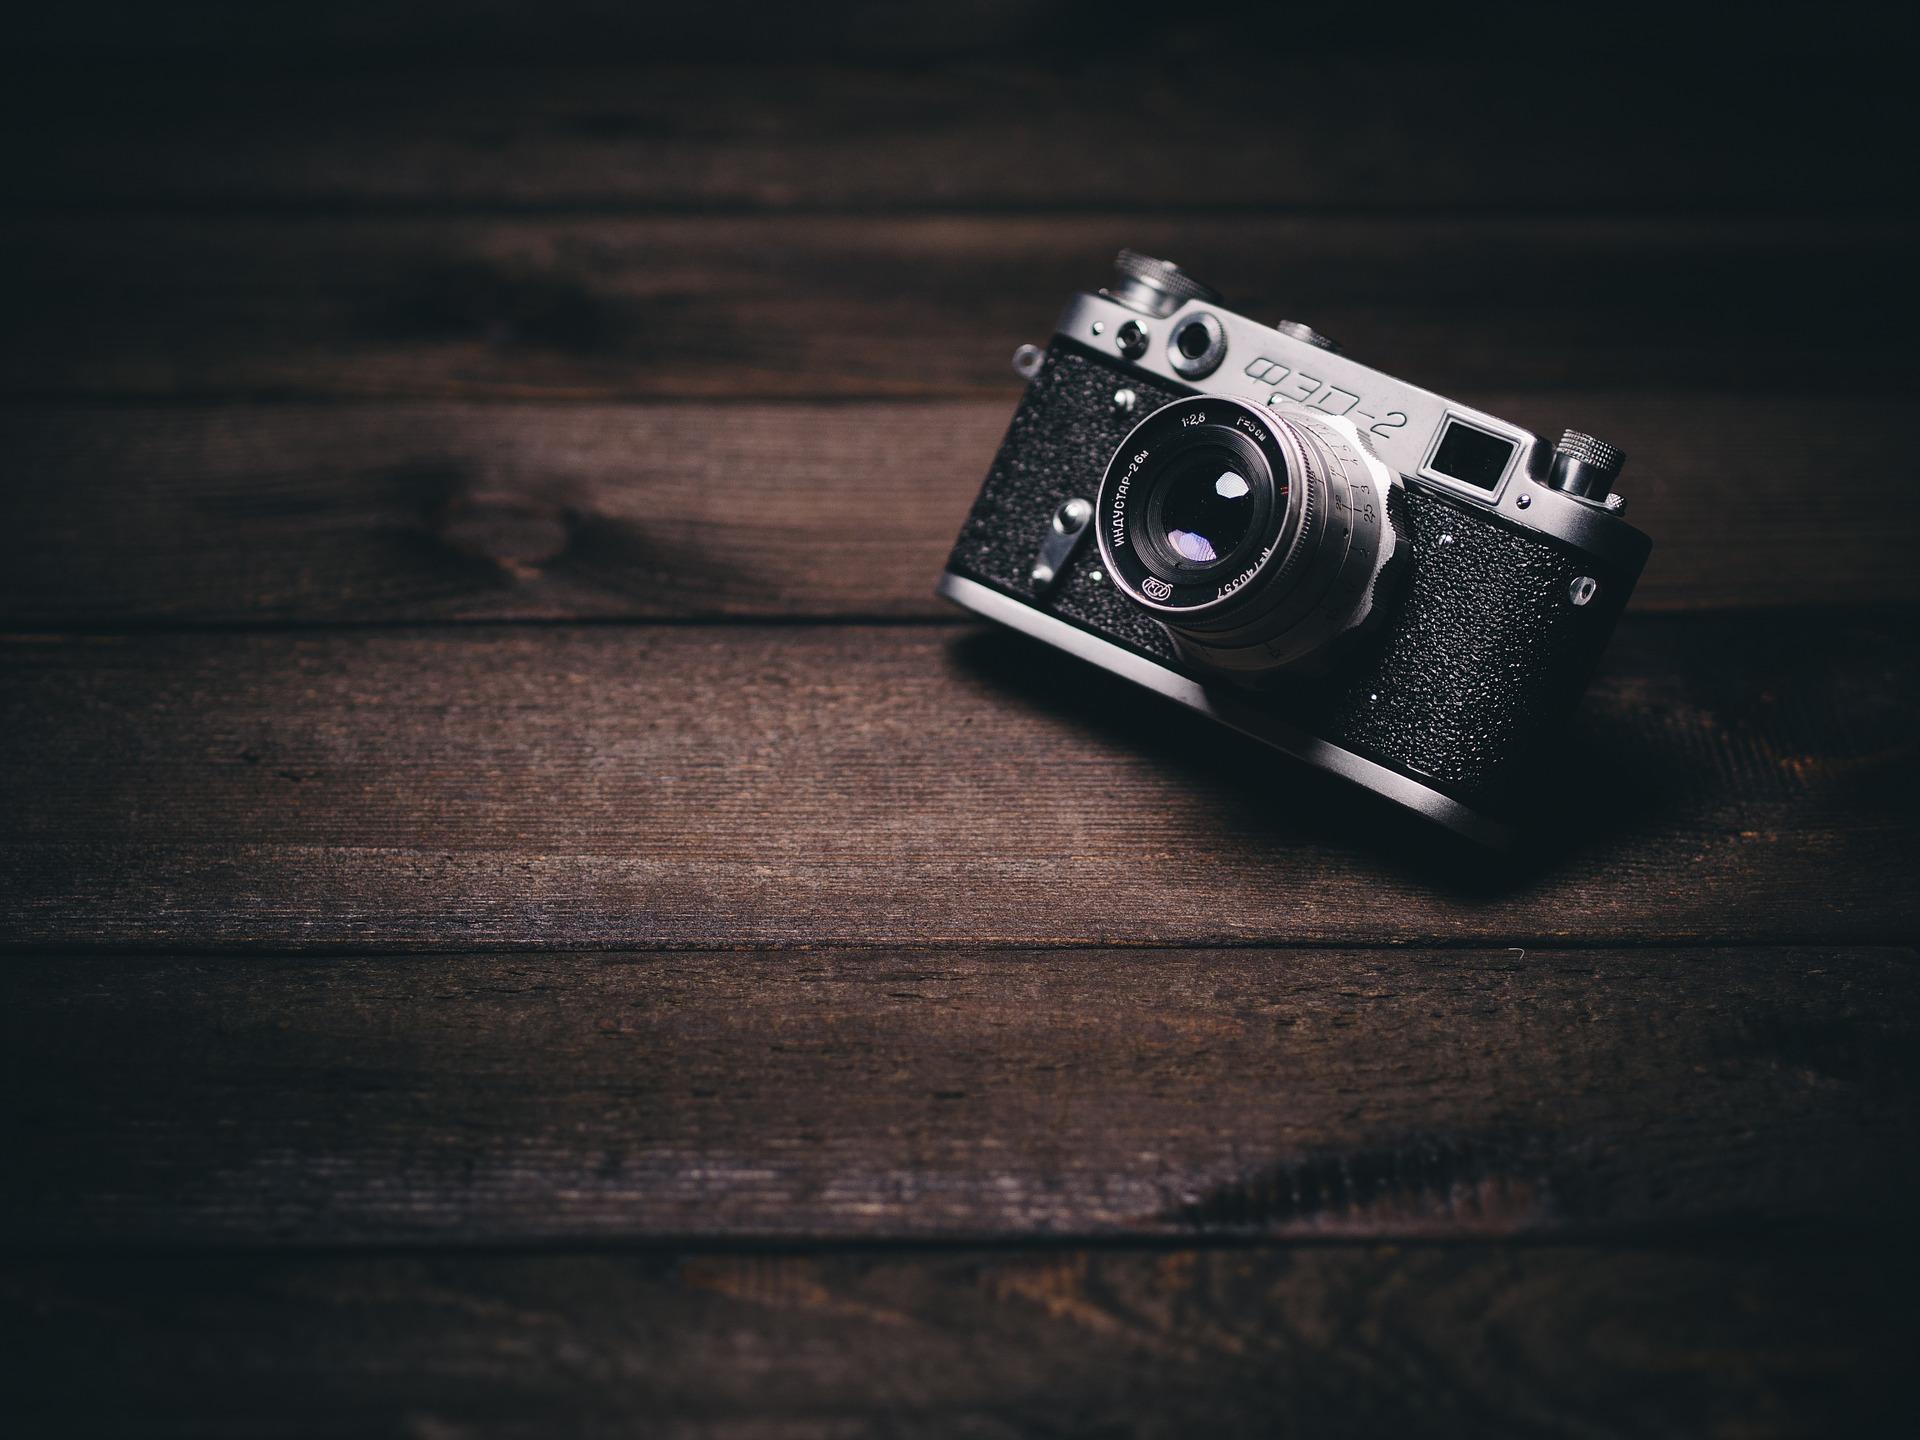 camera-820018_1920